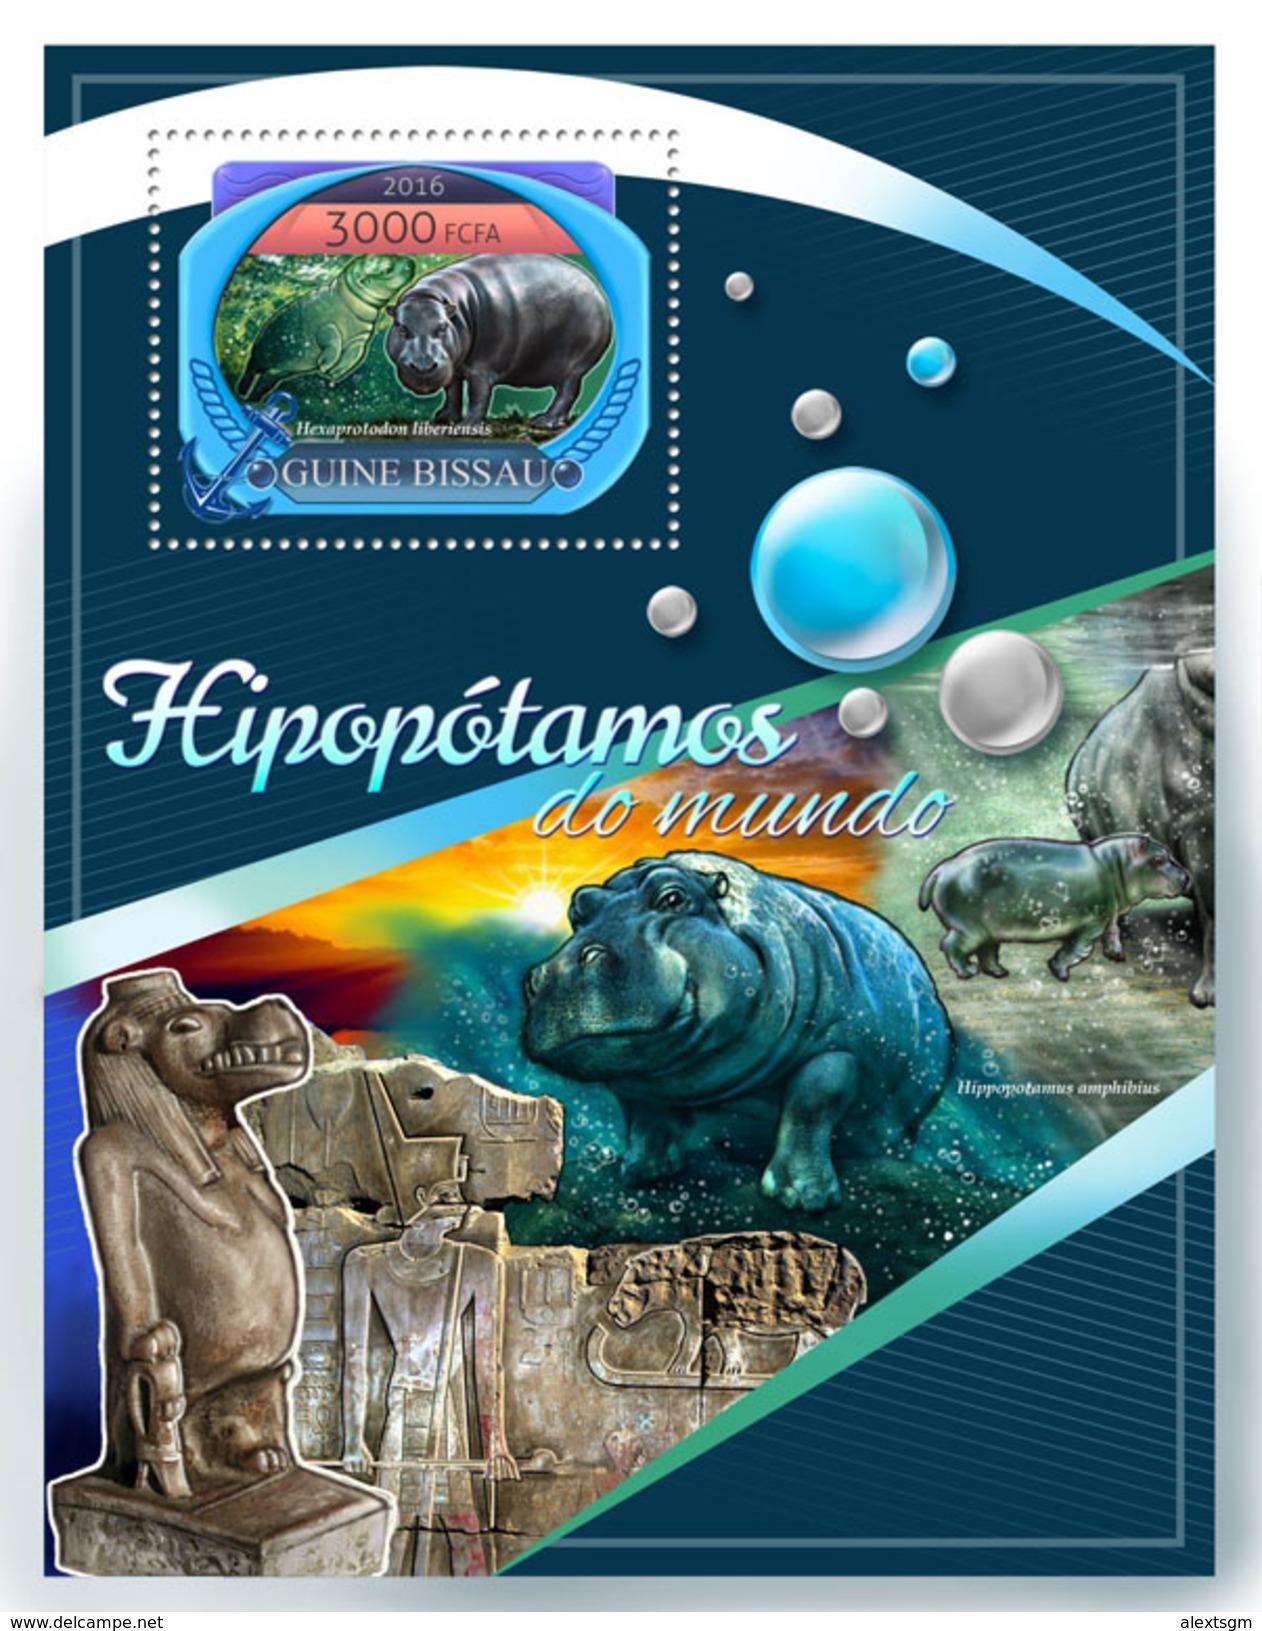 GUINEA BISSAU 2016 - Hippopotamus, Egyptology - YT BF1259 - Egyptologie